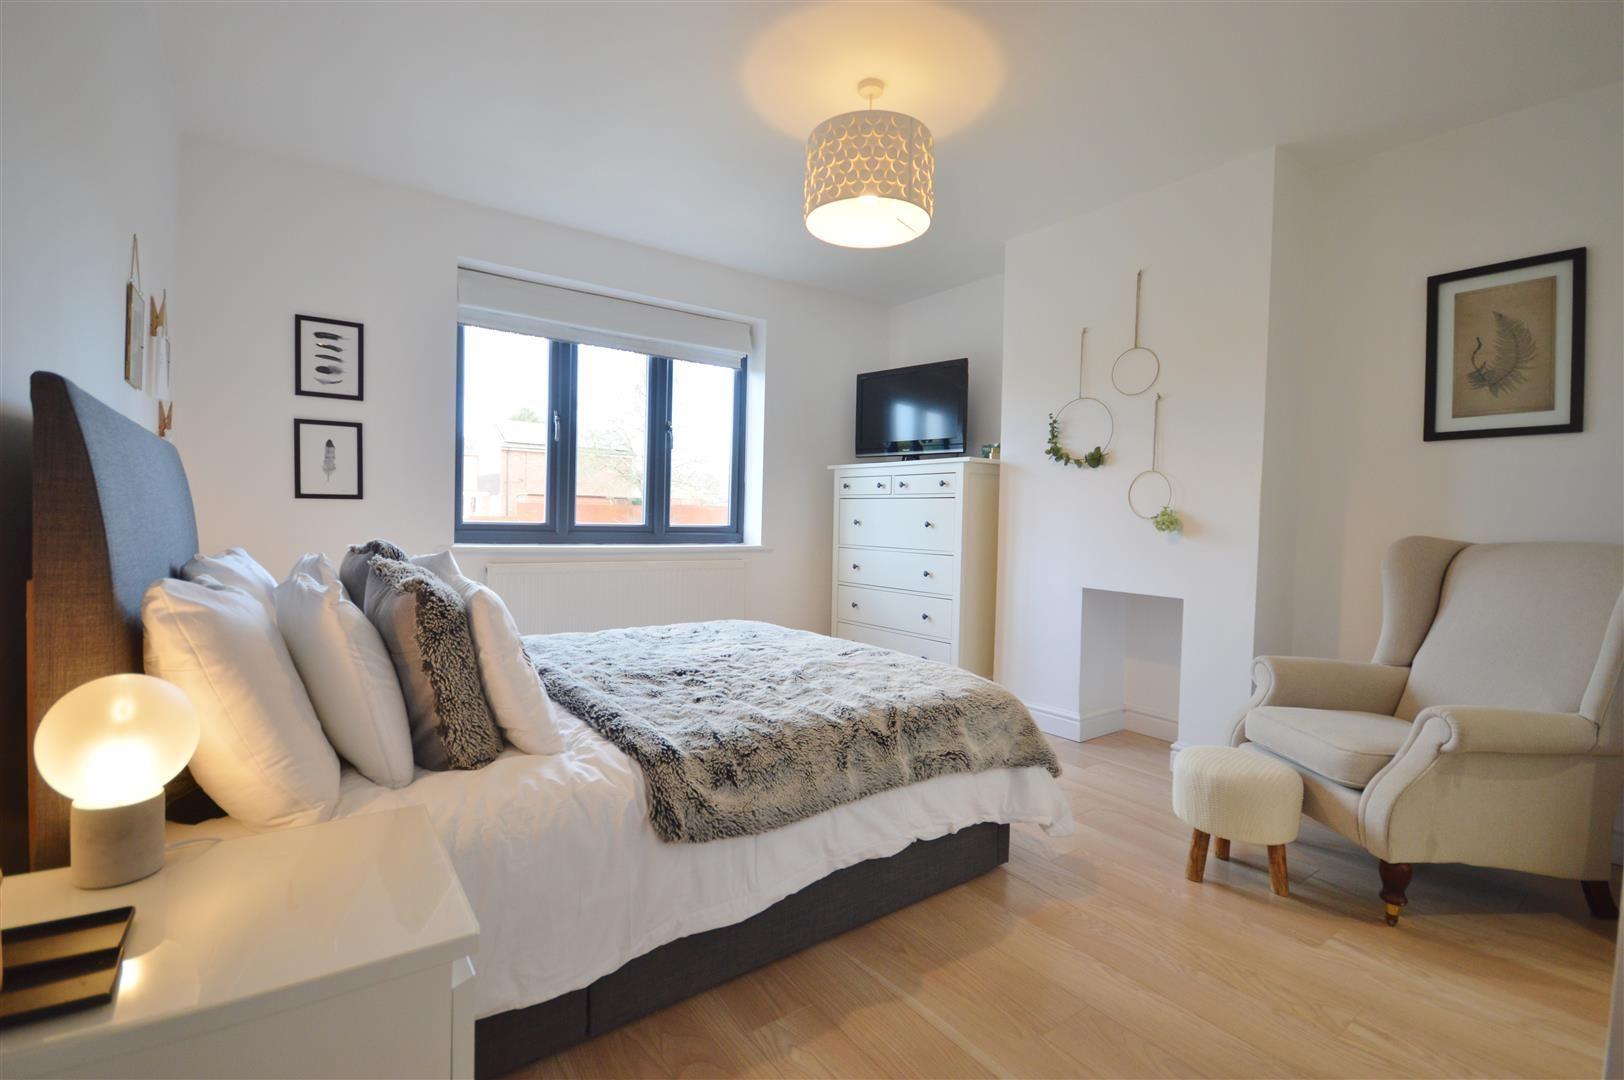 5 bed detached for sale in Leominster  - Property Image 10